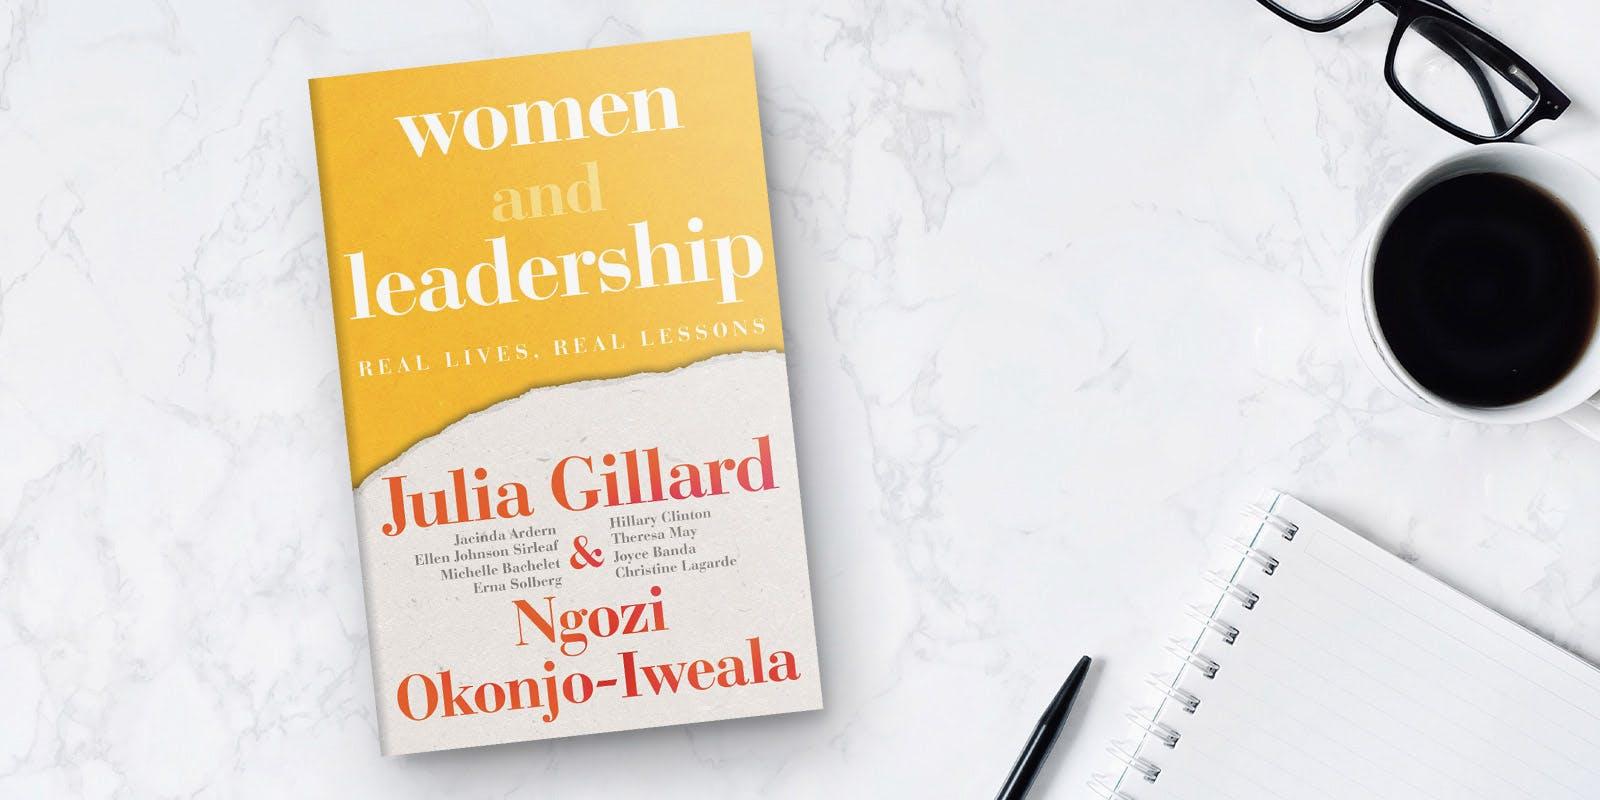 Julia Gillard and Ngozi Okonjo-Iweala Q&A